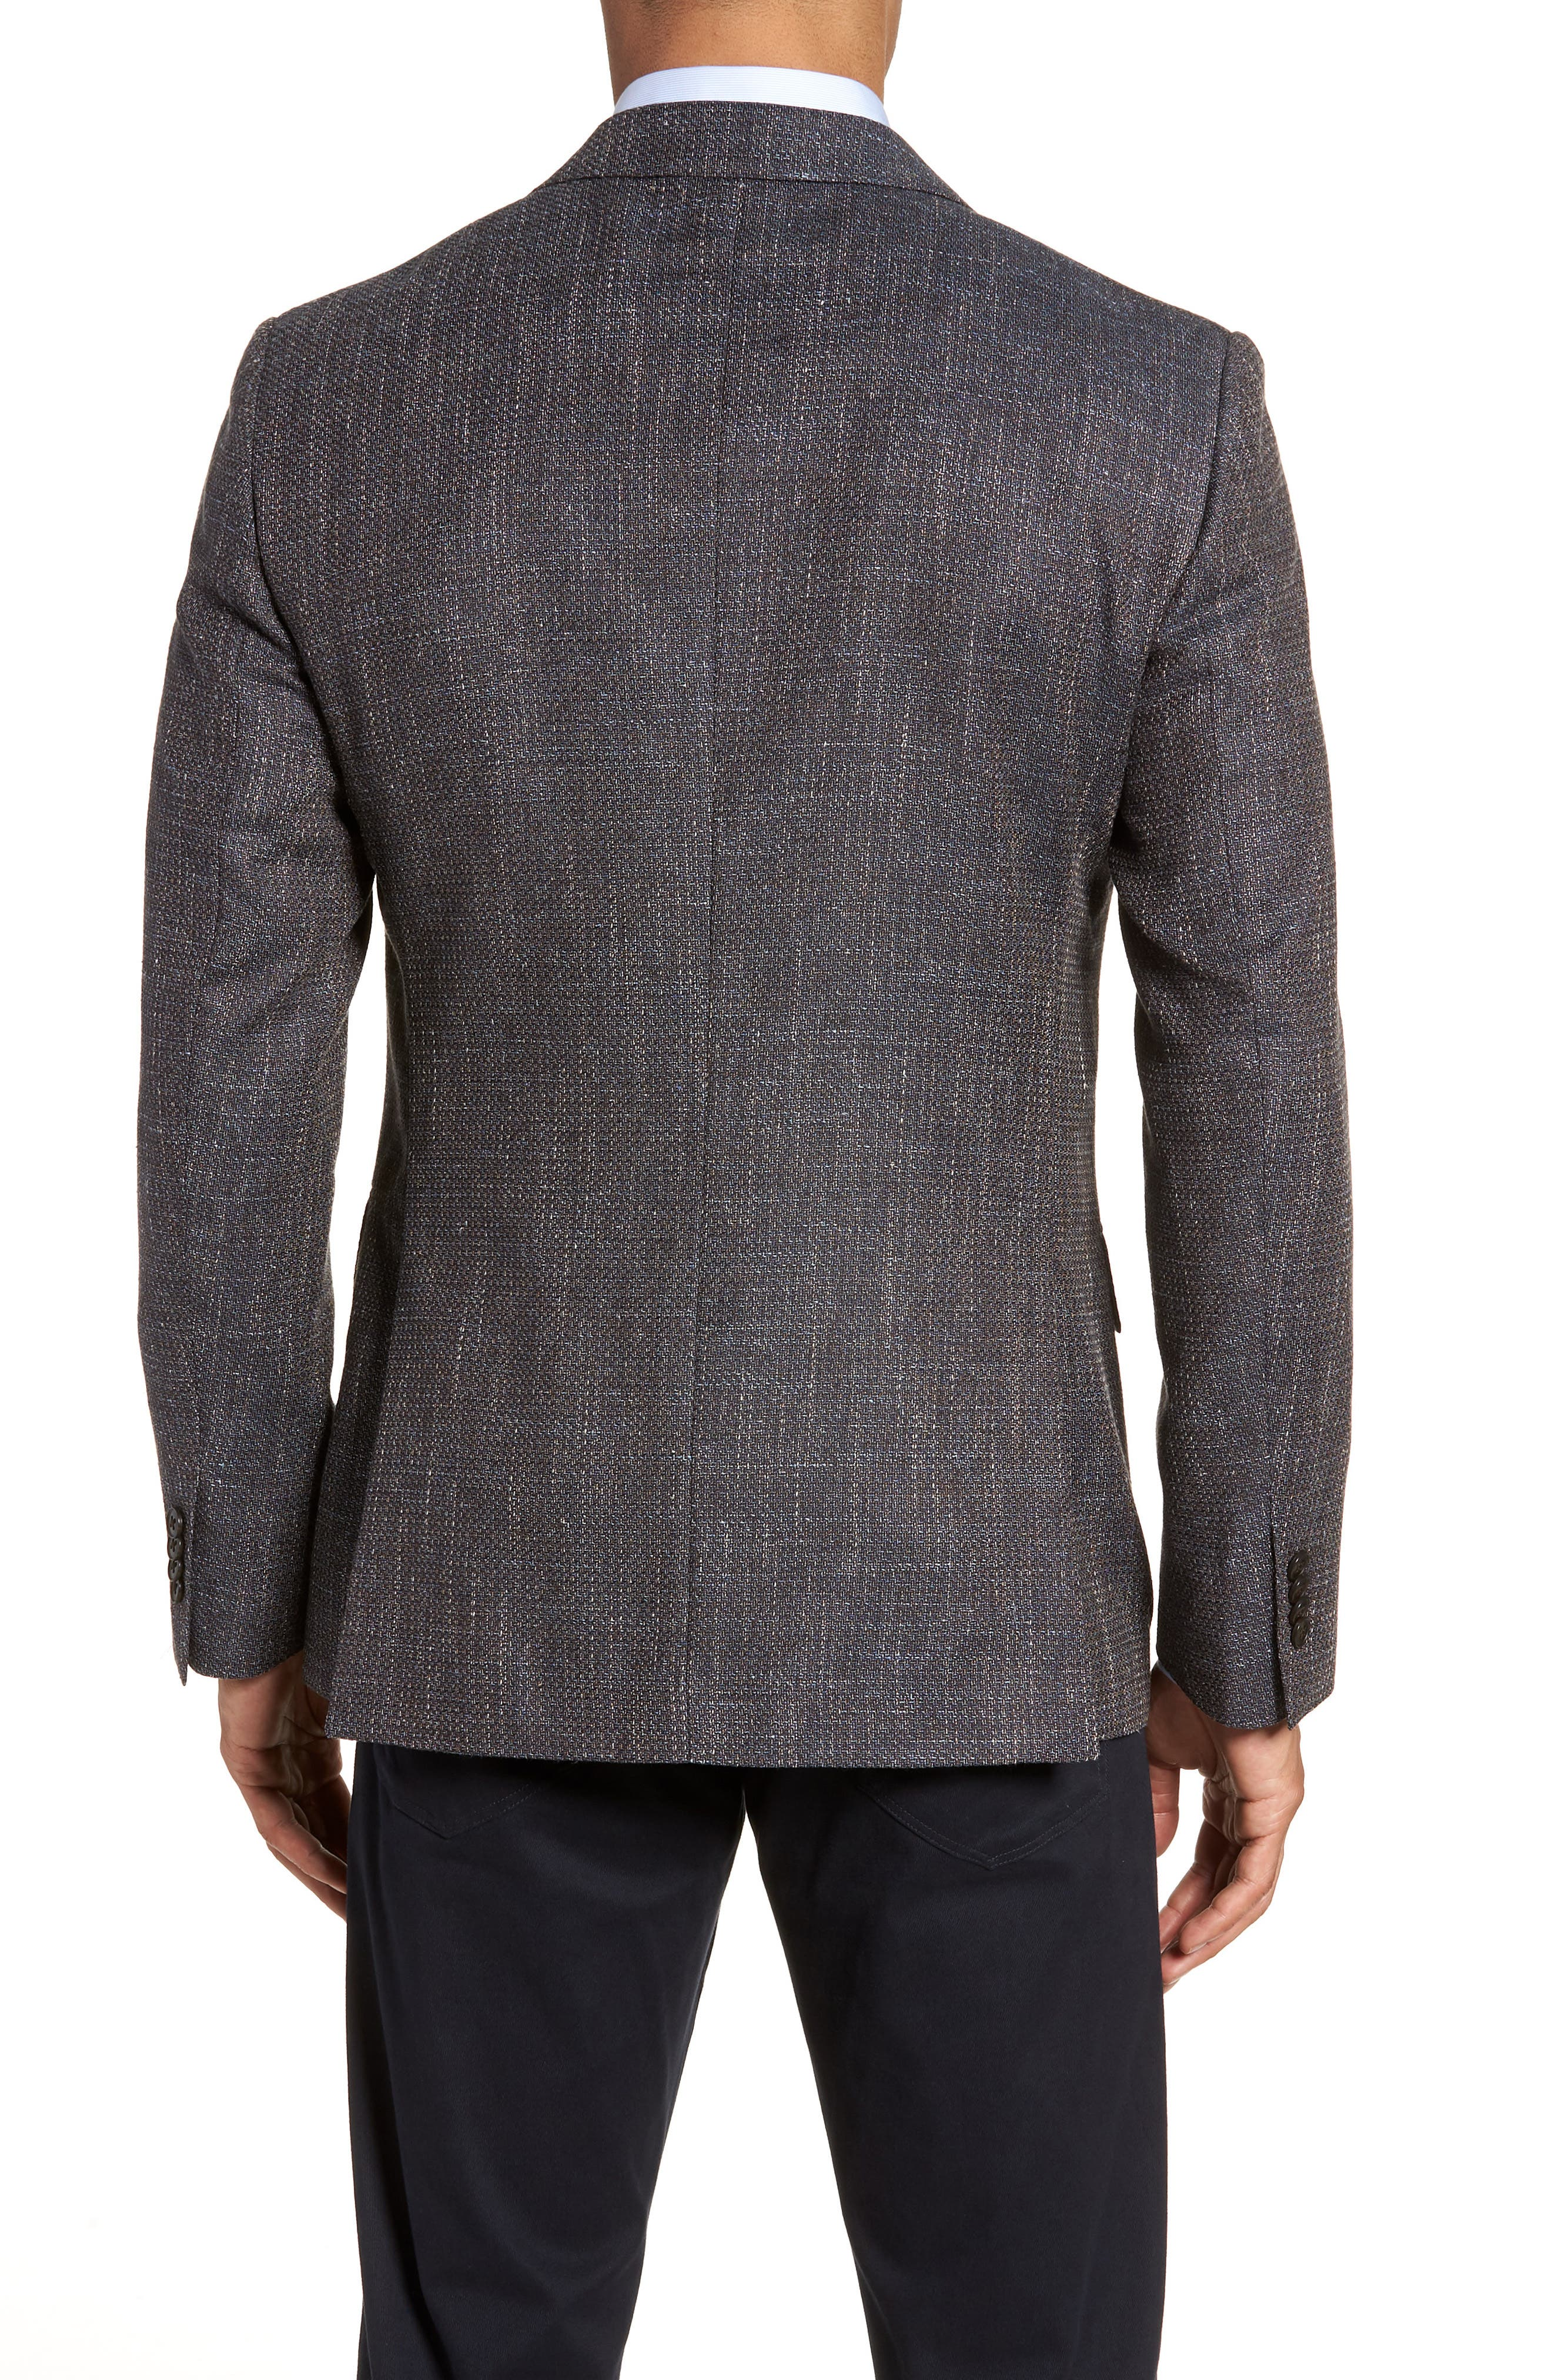 Five Bridges Slim Fit Tweed Sport Coat,                             Alternate thumbnail 2, color,                             800